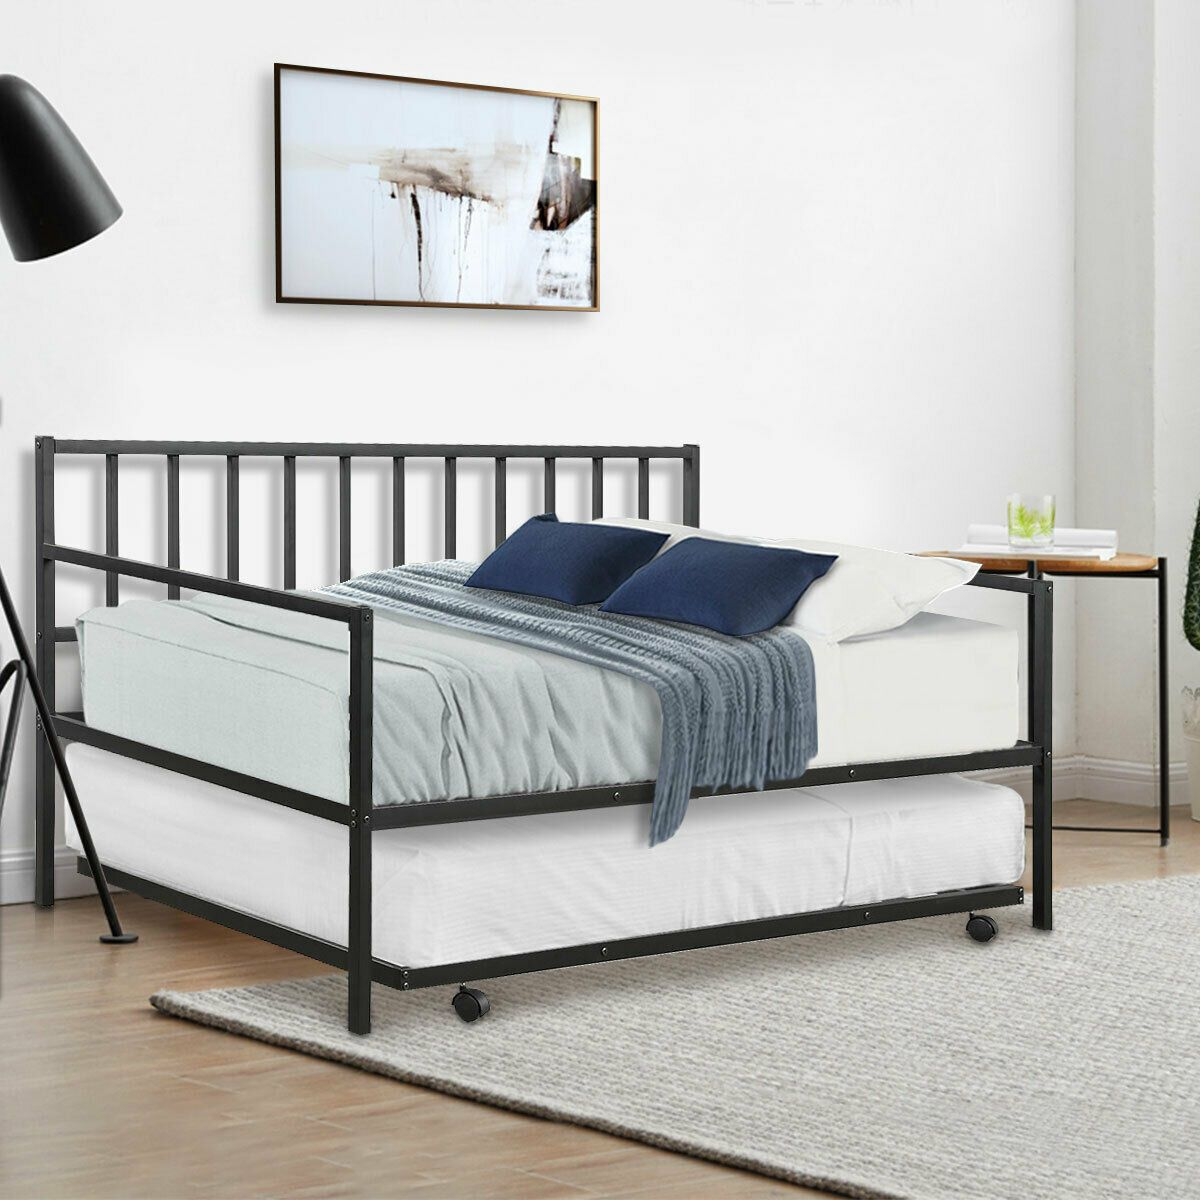 Twin Size Daybed And Trundle Frame Set Trundle Bed Bed Solid Wood Platform Bed Steel Bed Frame